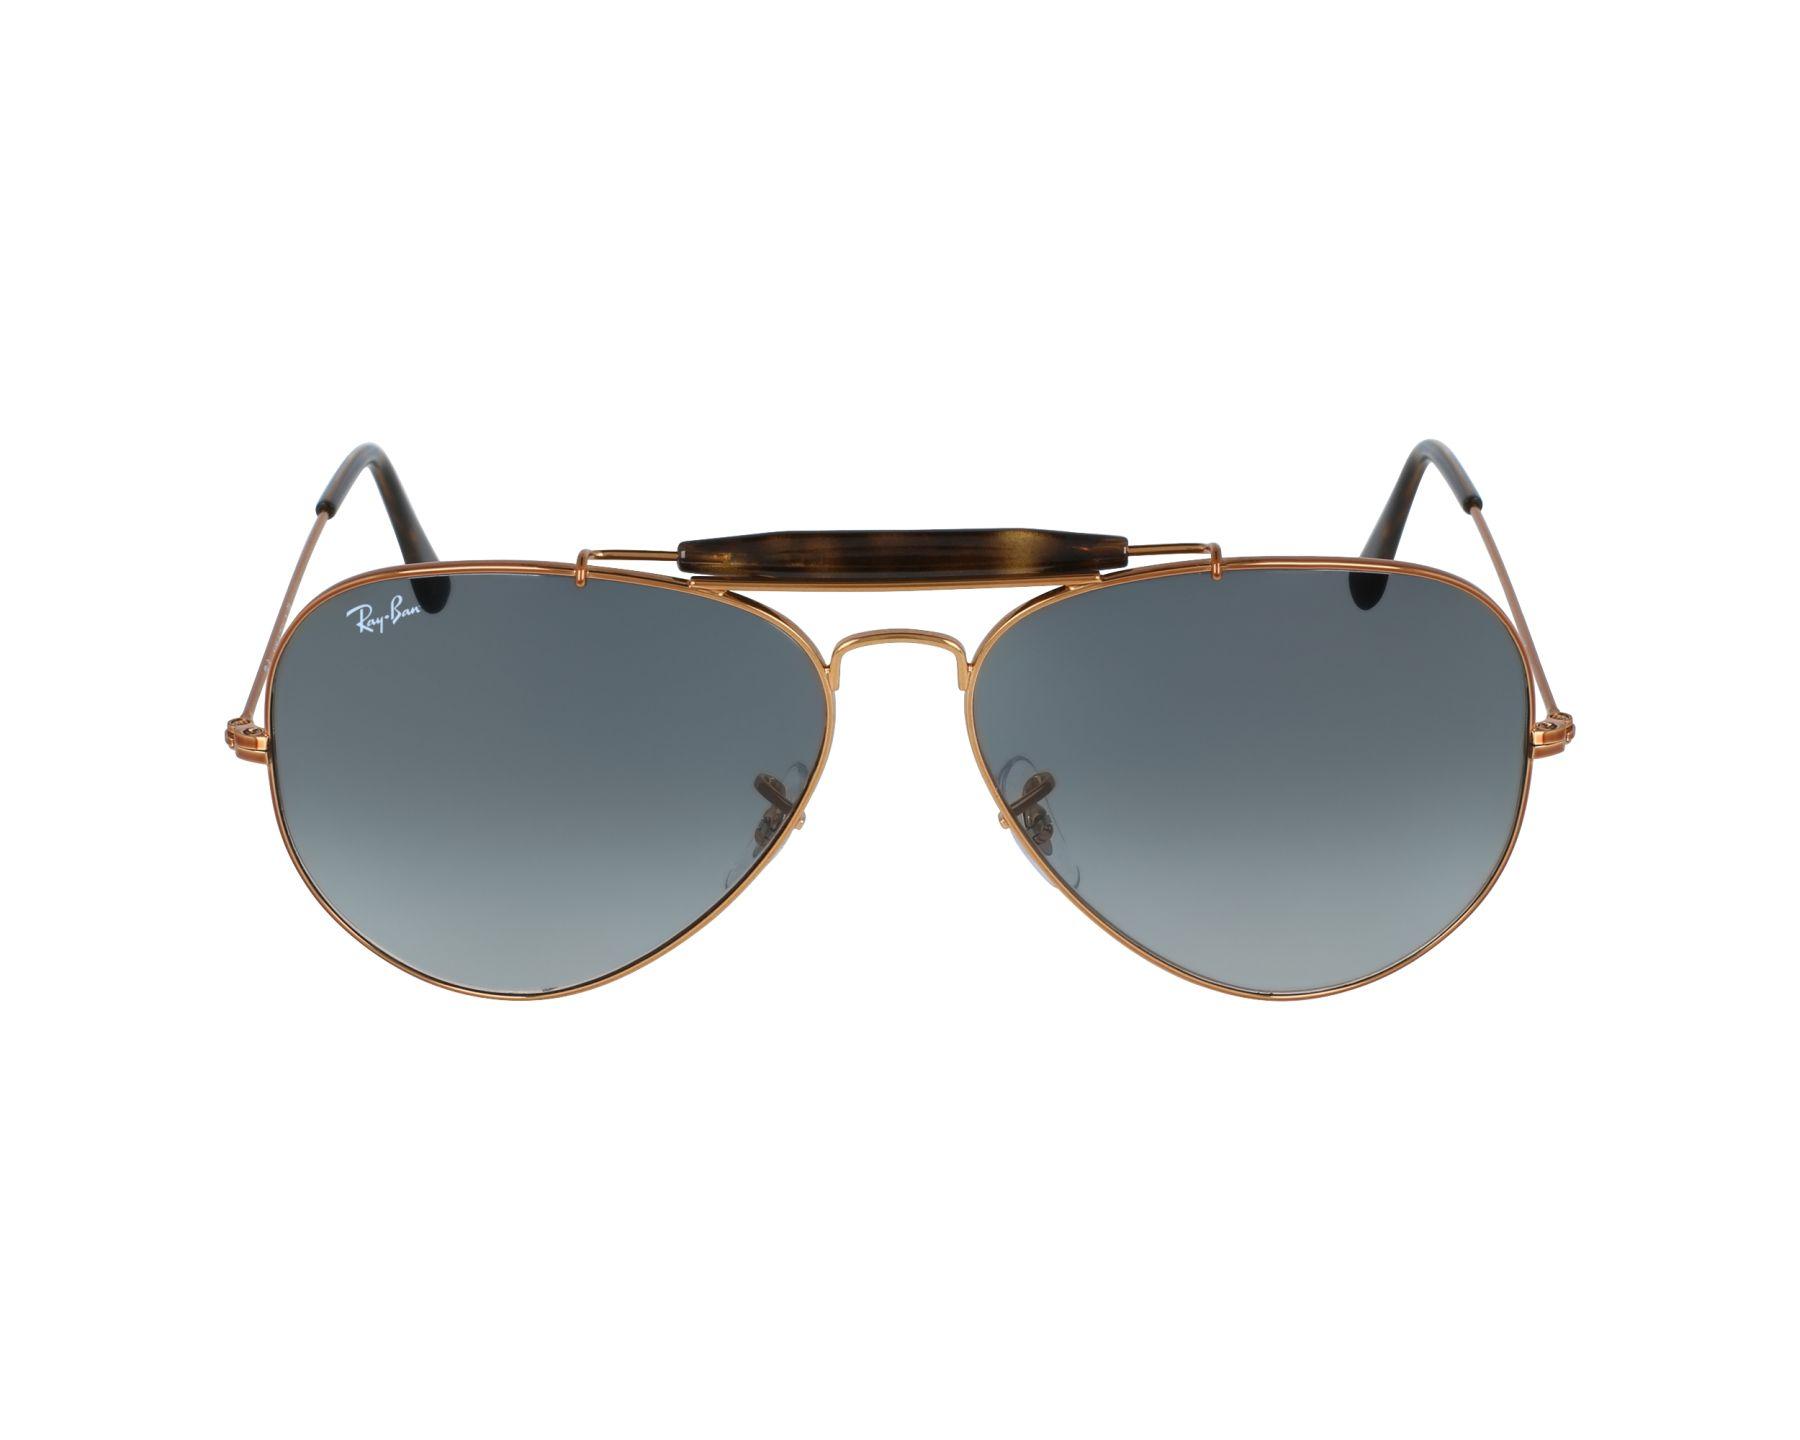 d456e2b3ac186 Gafas de Sol Ray-Ban Outdoorsman II RB-3029 197 71